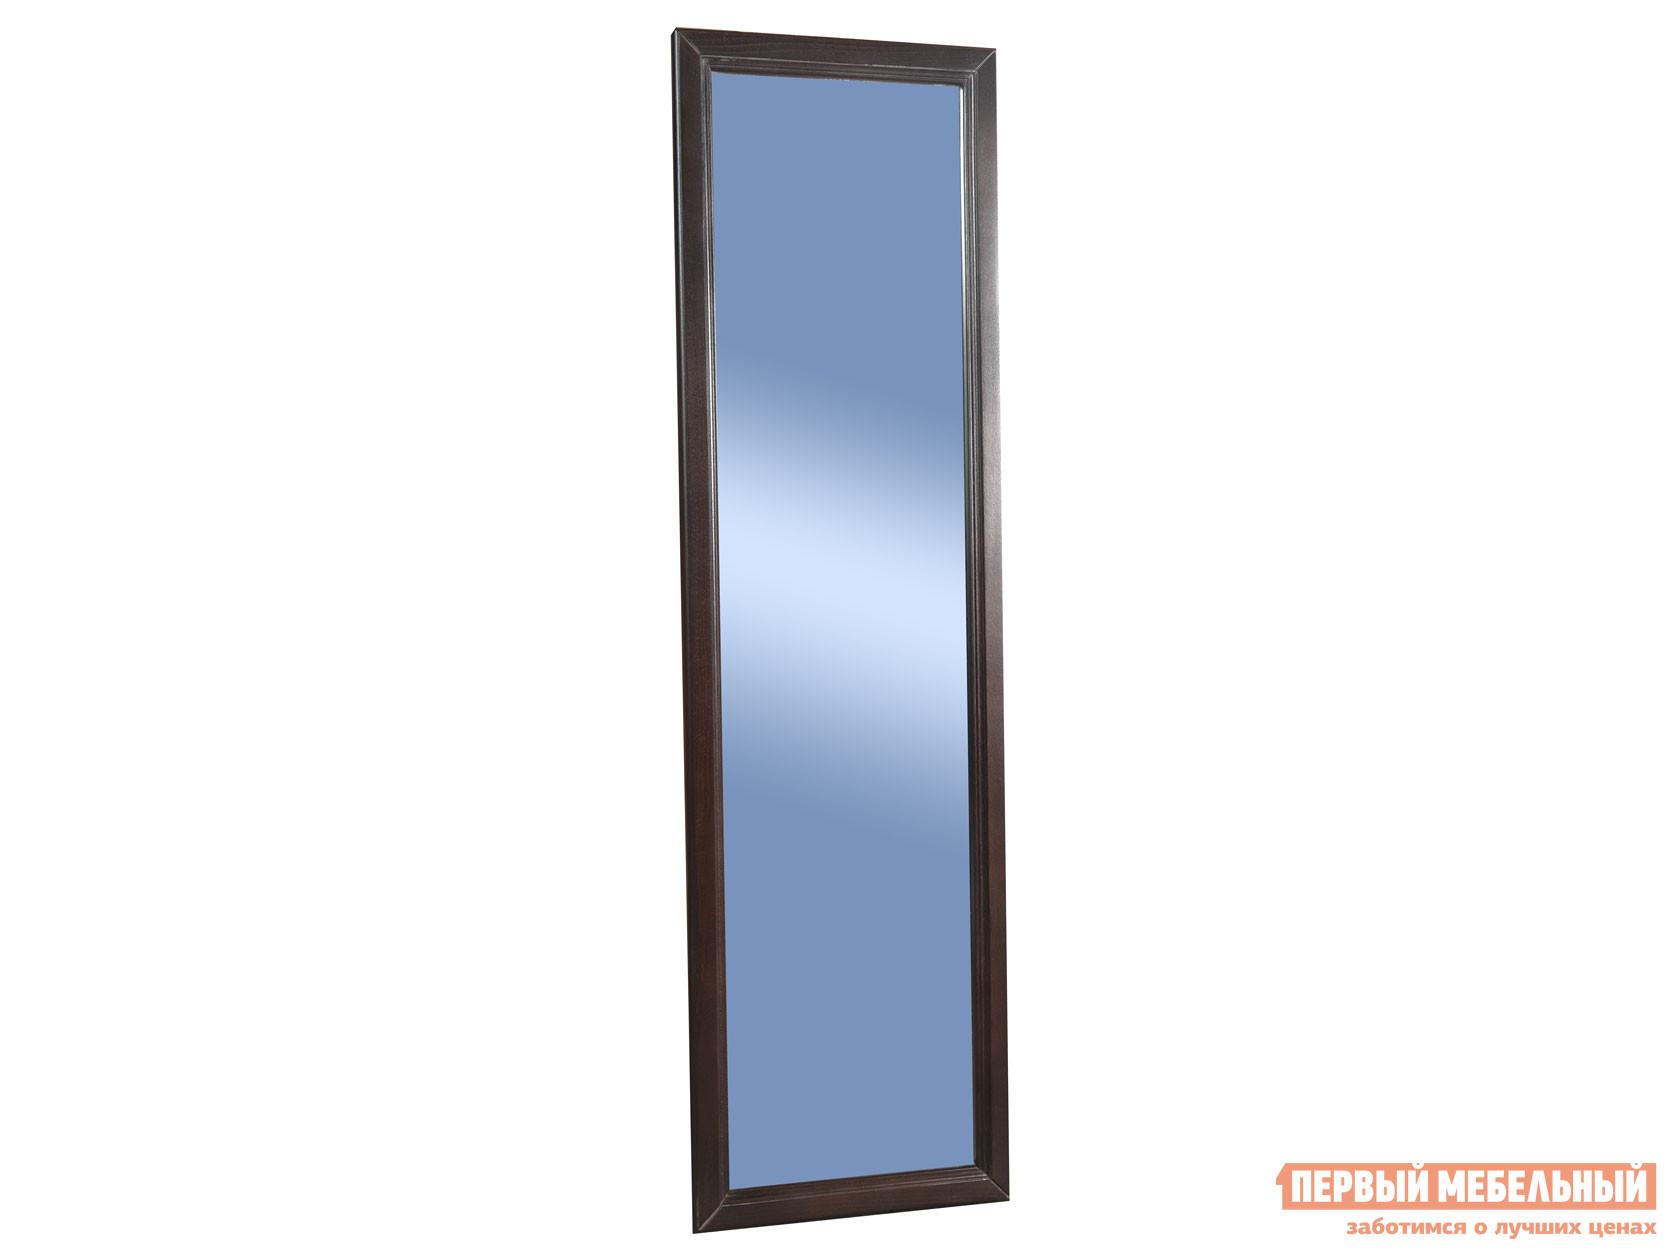 Настенное зеркало Мебелик Зеркало настенное Селена зеркало настенное home philosophy male collection 70379